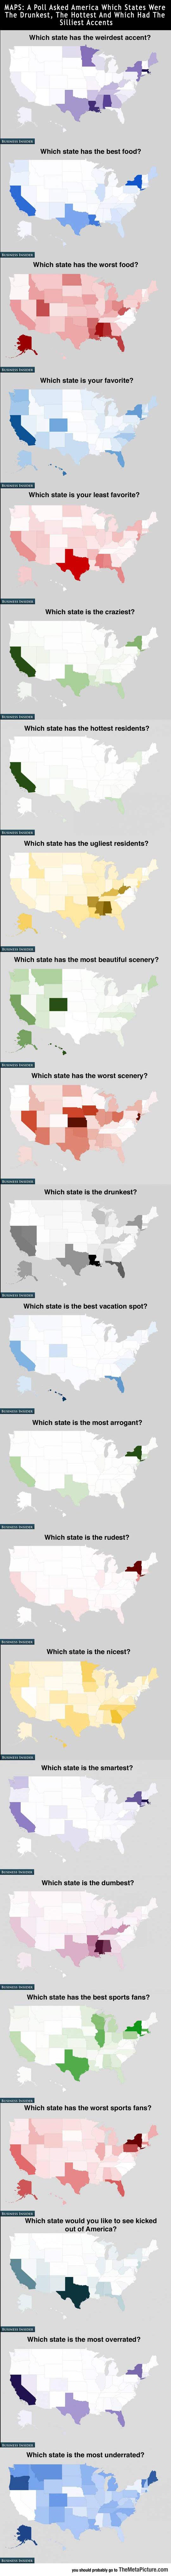 cool-USA-map-poll-states